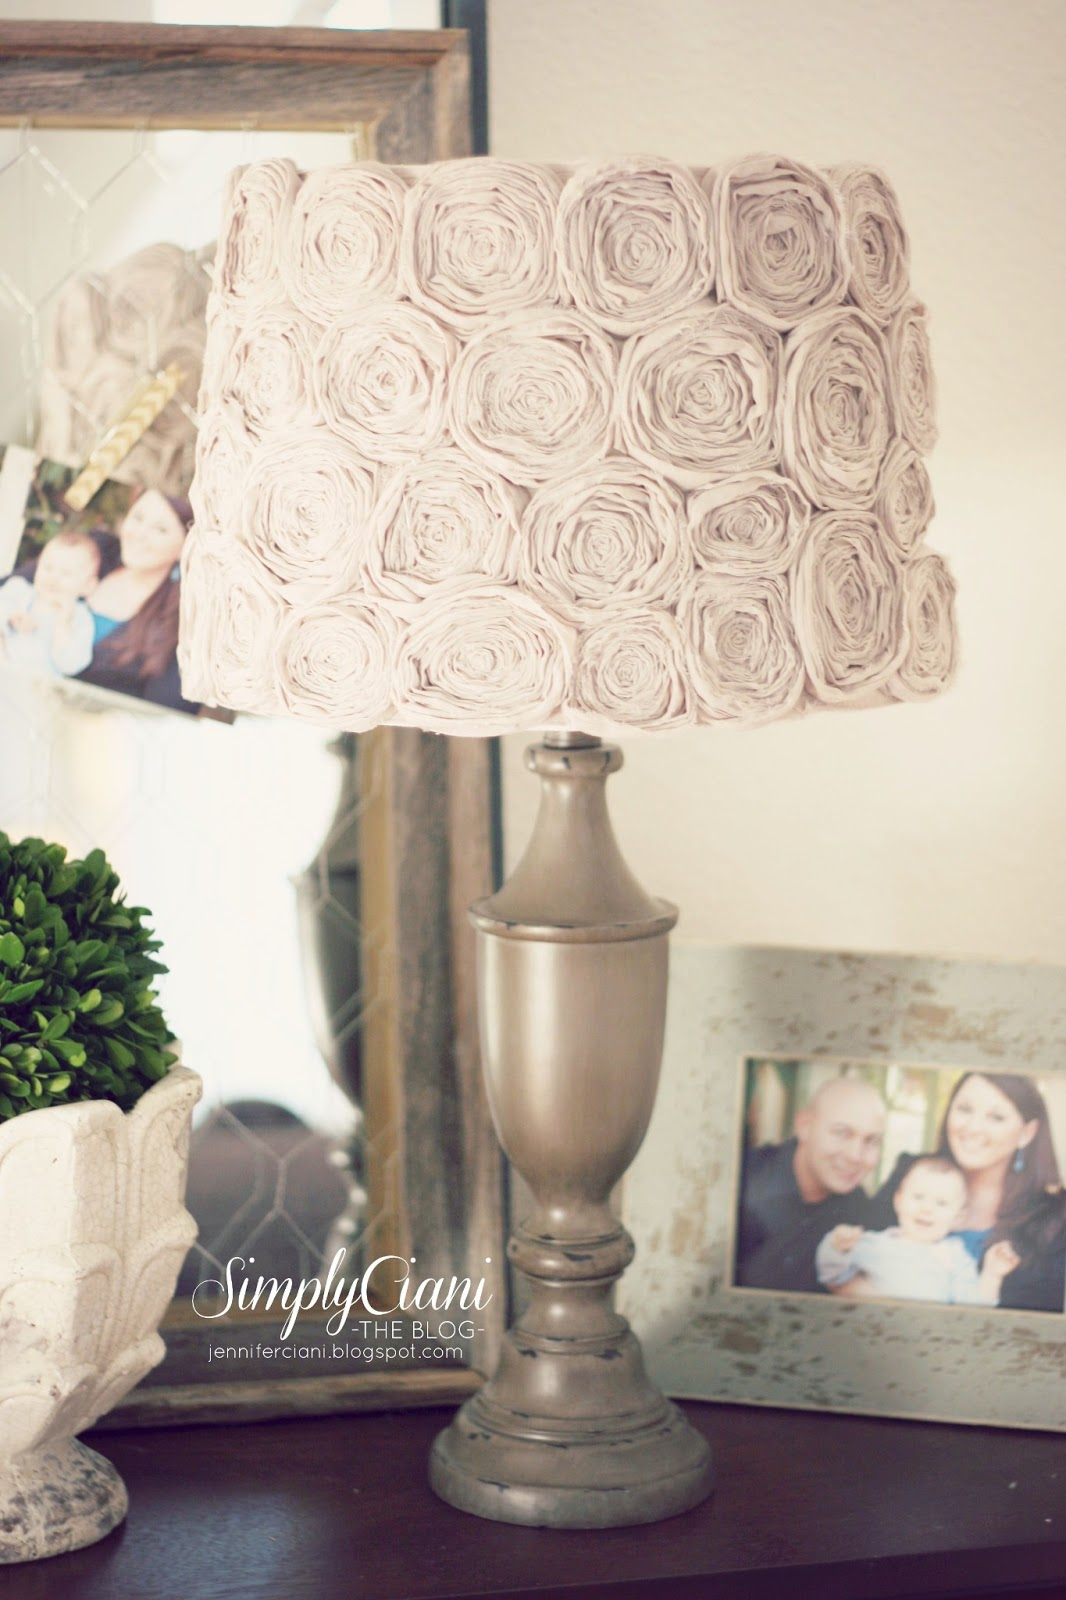 Diy Shabby Chic Rosette Lamp Shade | Simply Ciani